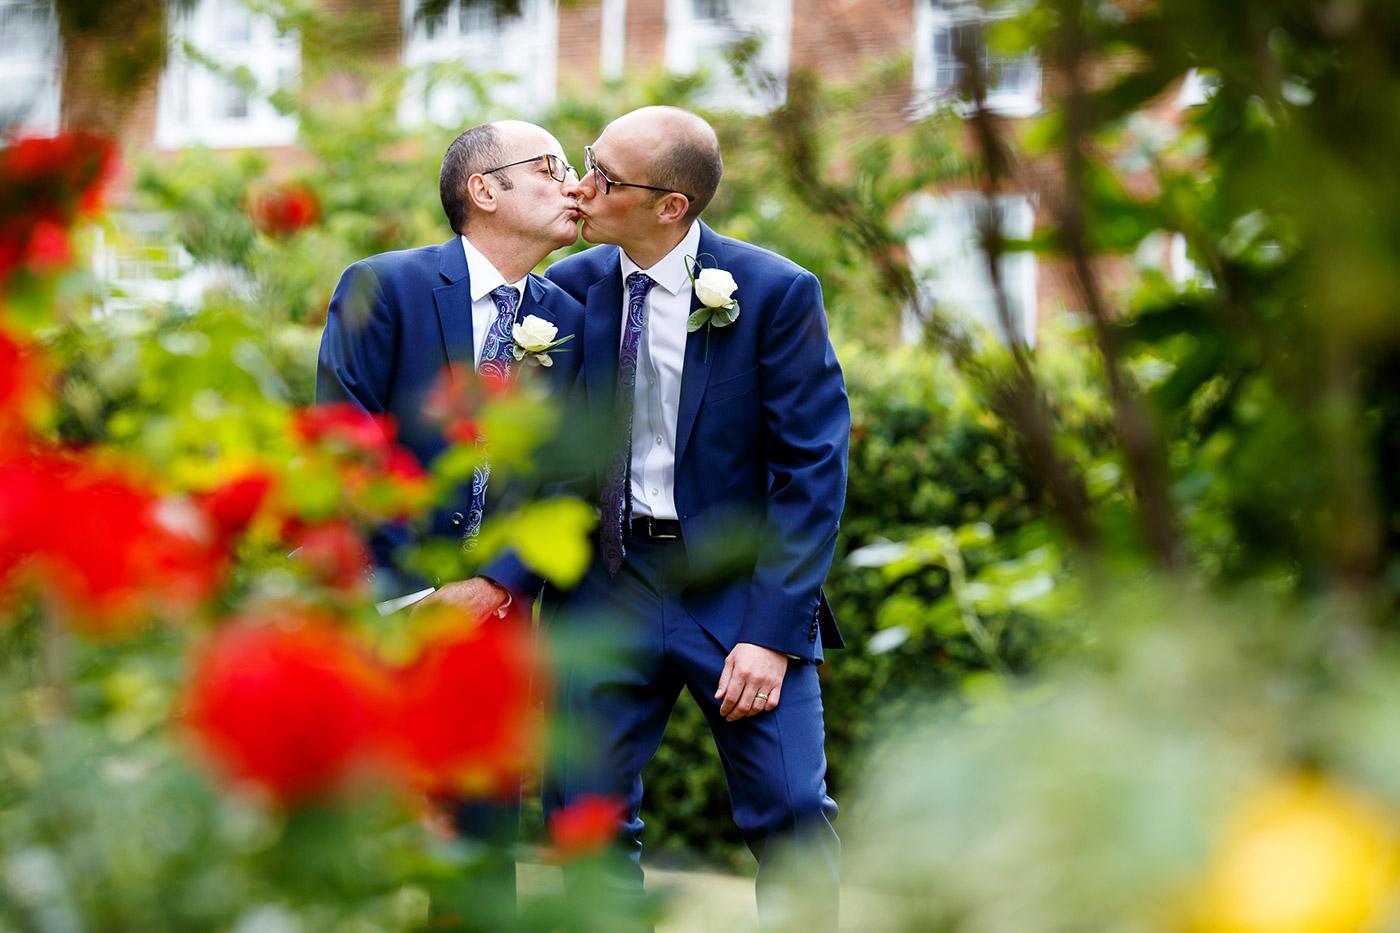 homestead-court-same-sex-wedding-2.jpg